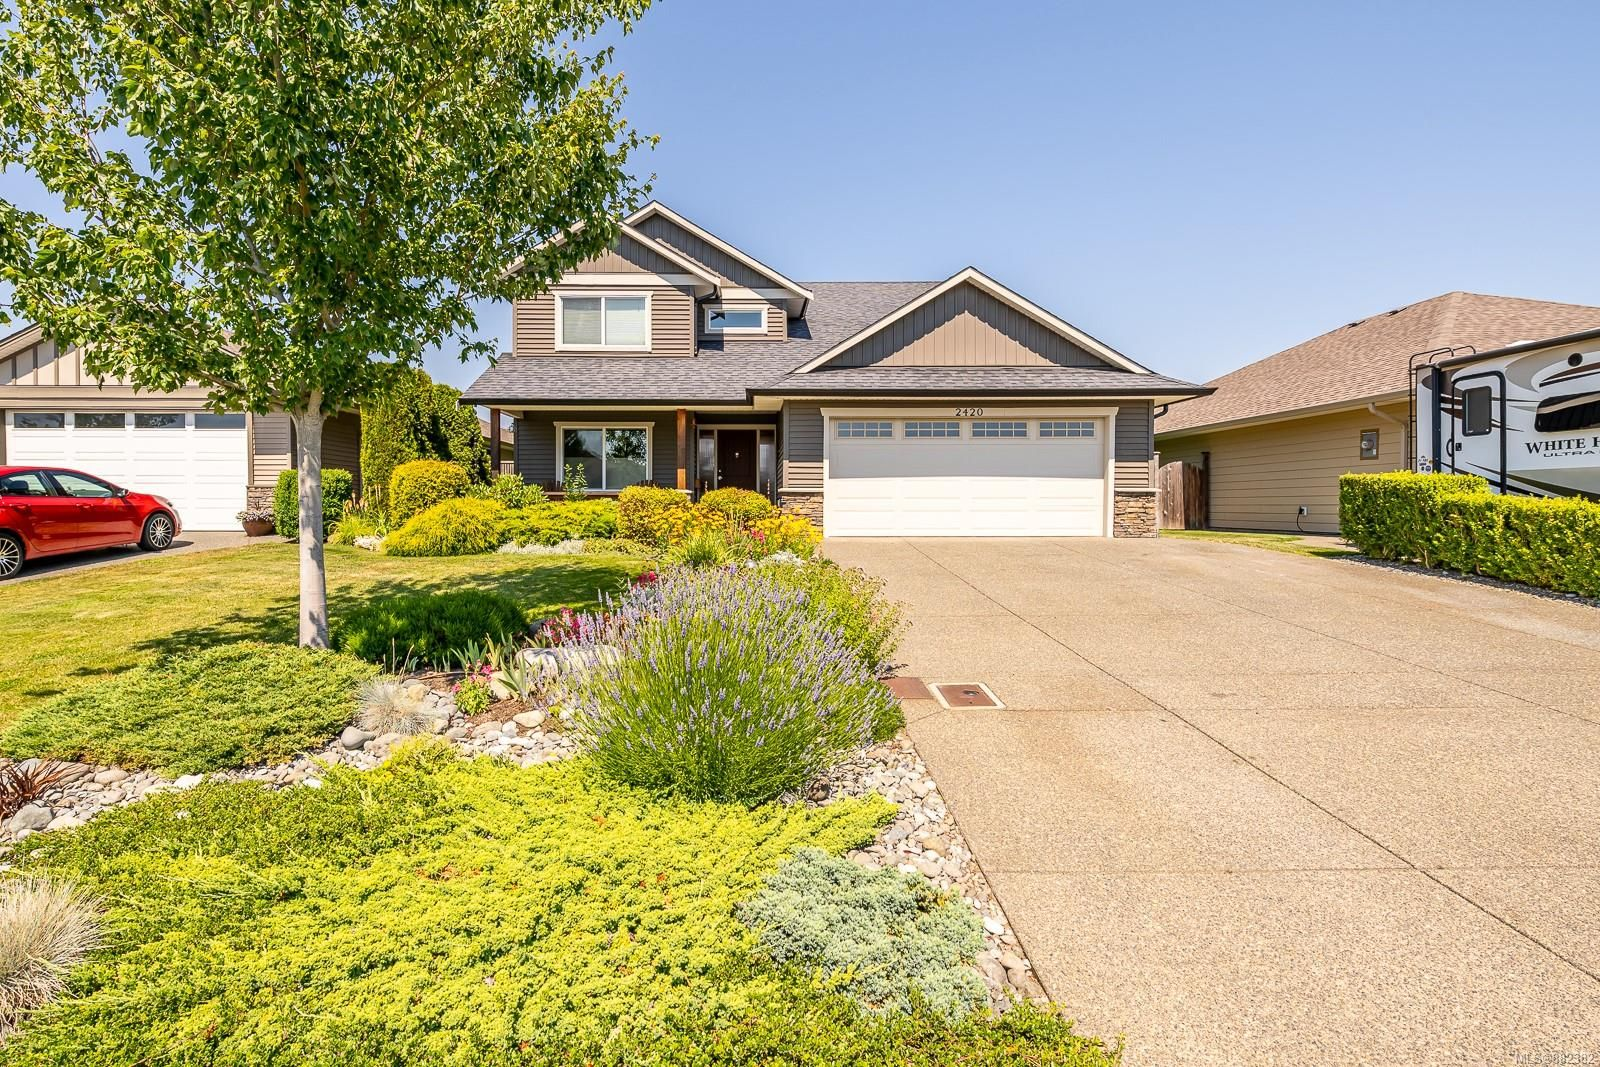 Main Photo: 2420 Avro Arrow Dr in : CV Comox (Town of) House for sale (Comox Valley)  : MLS®# 882382